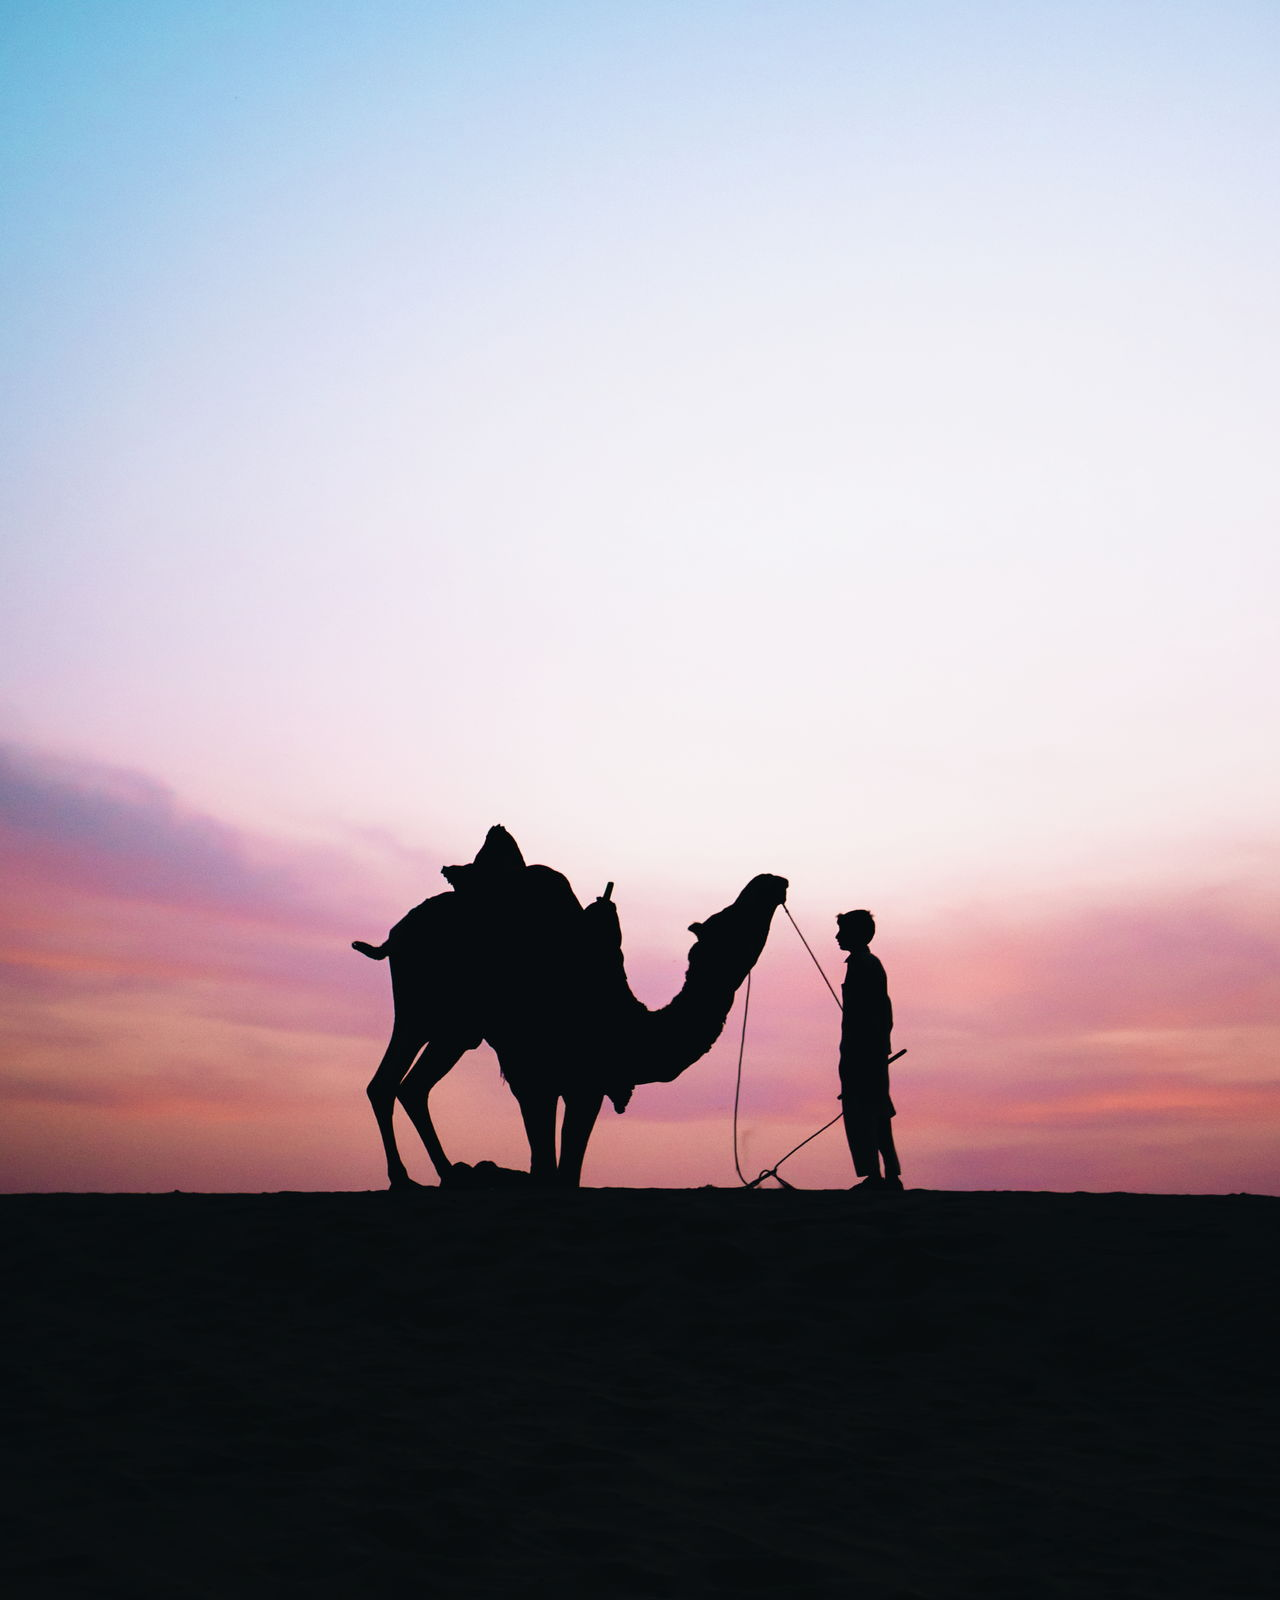 Beautiful stock photos of elefant, sunset, silhouette, horse, riding